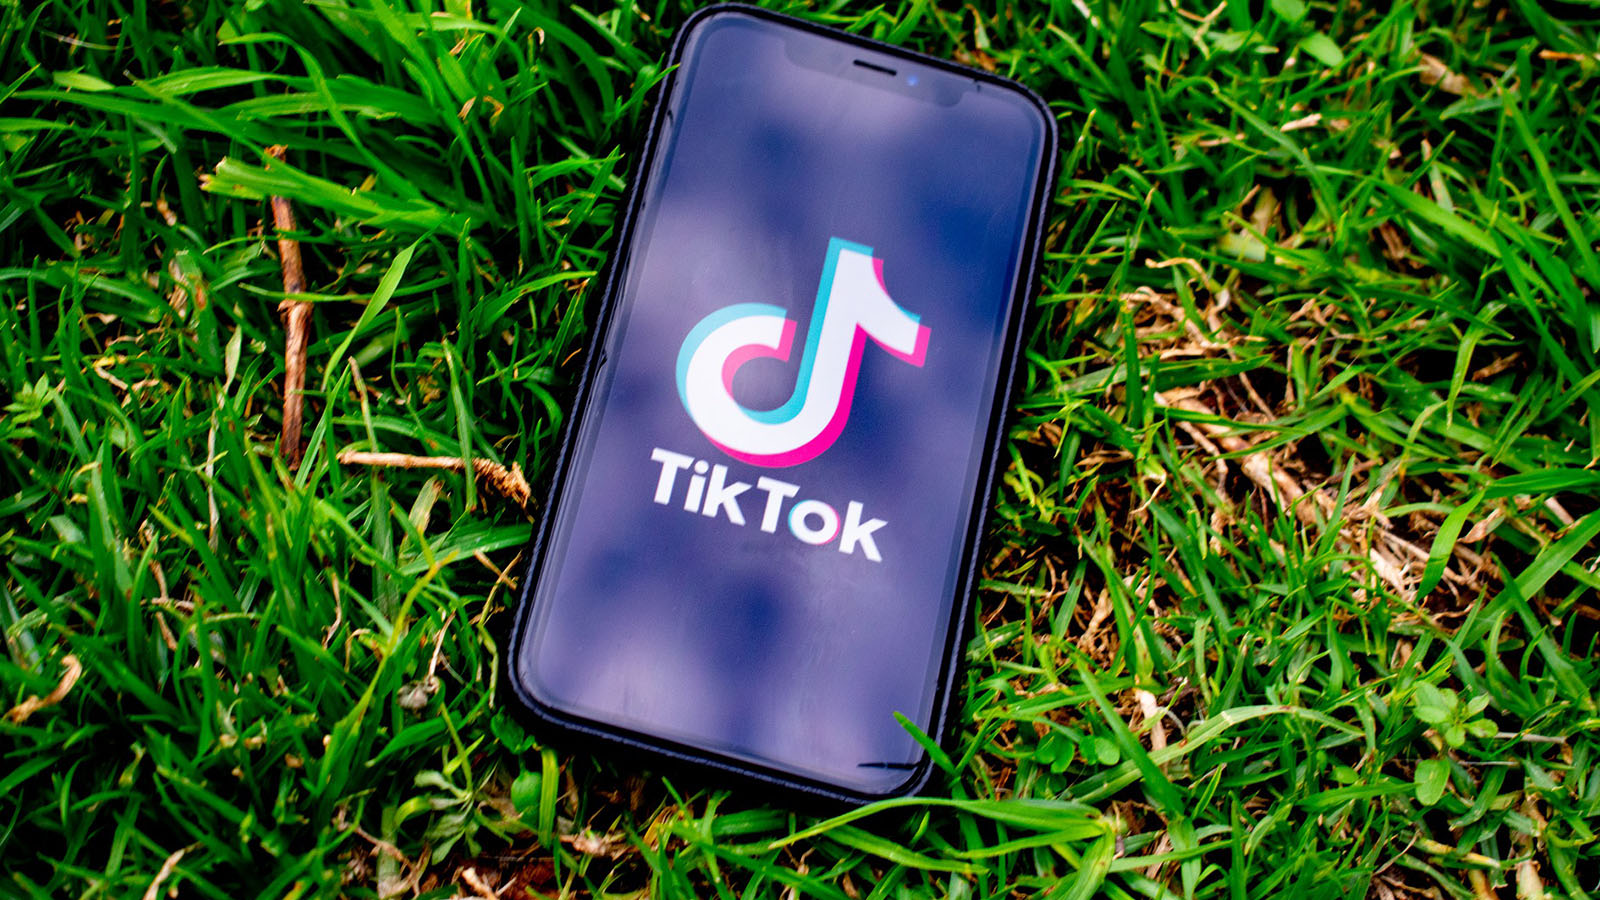 TIkTok on phone laying on grass